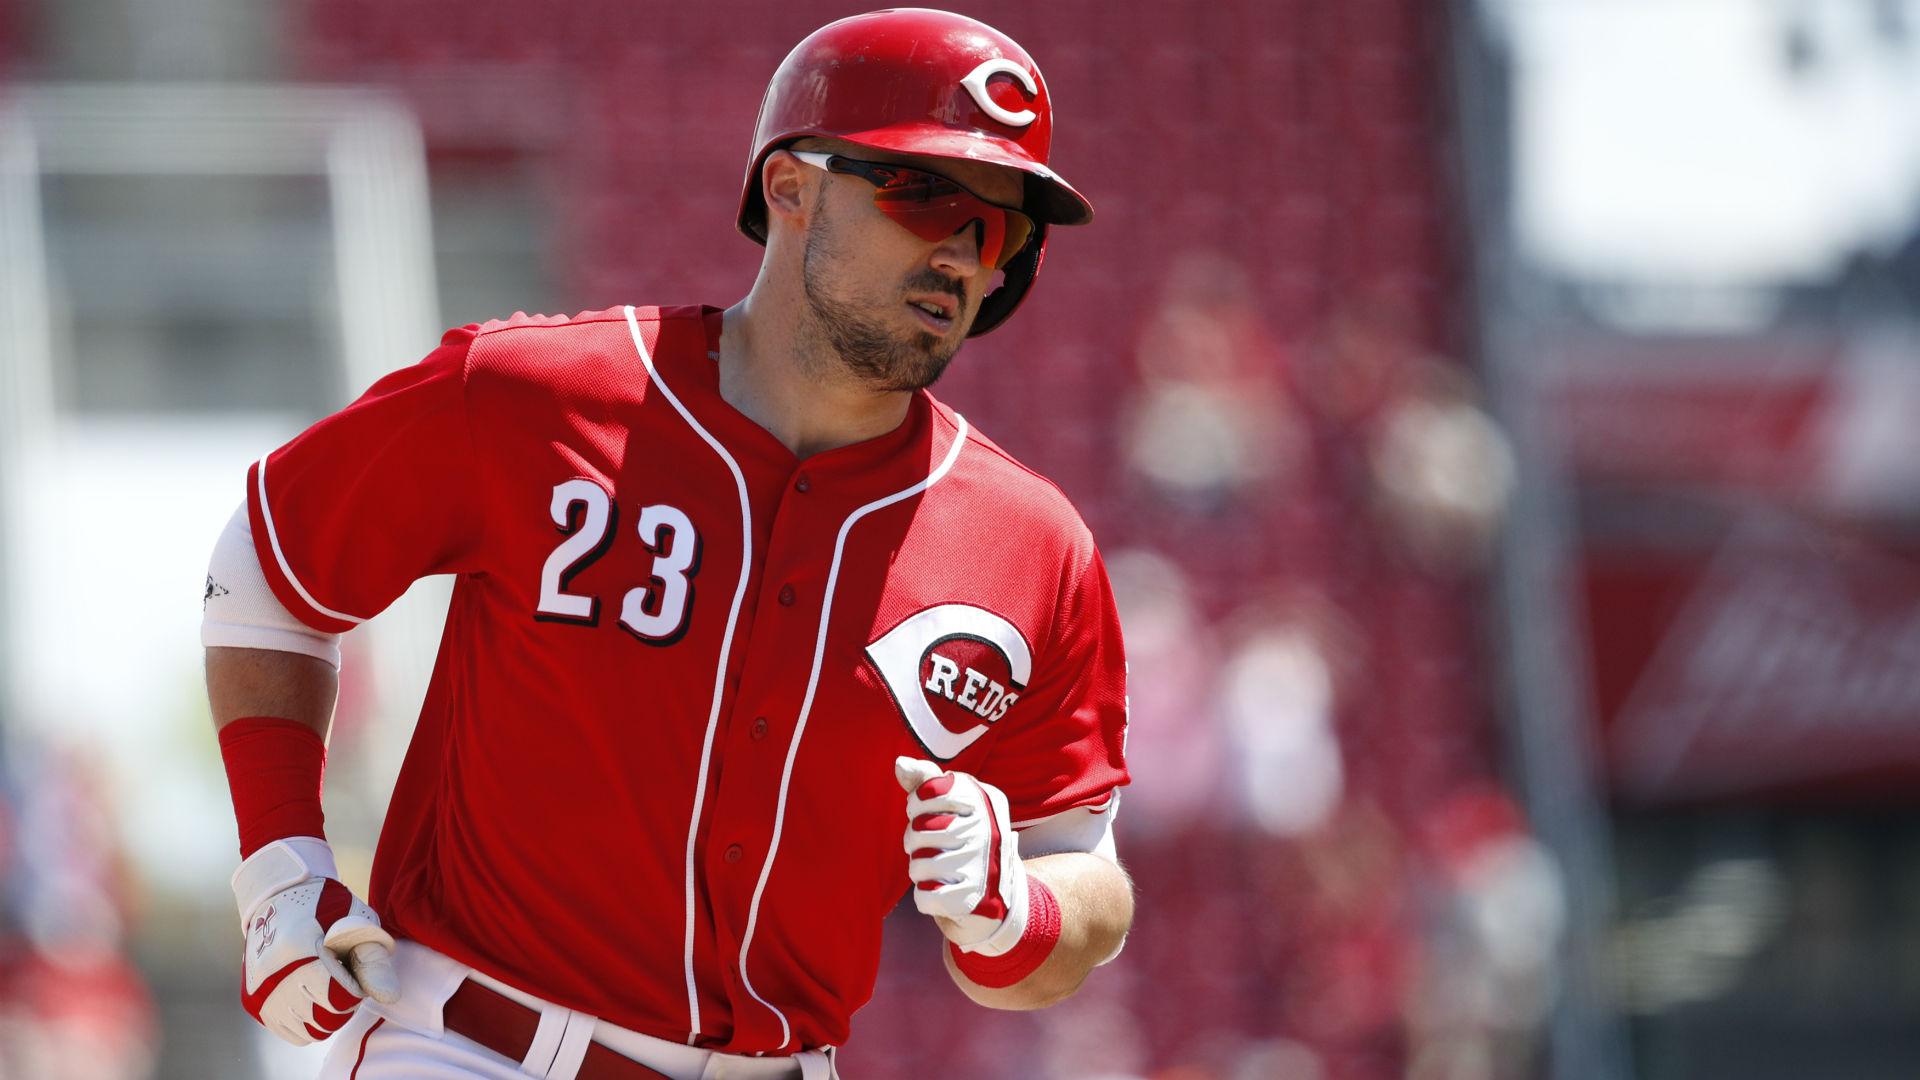 MLB trade rumors: Reds outfielder Adam Duvall drawing interest despite down season